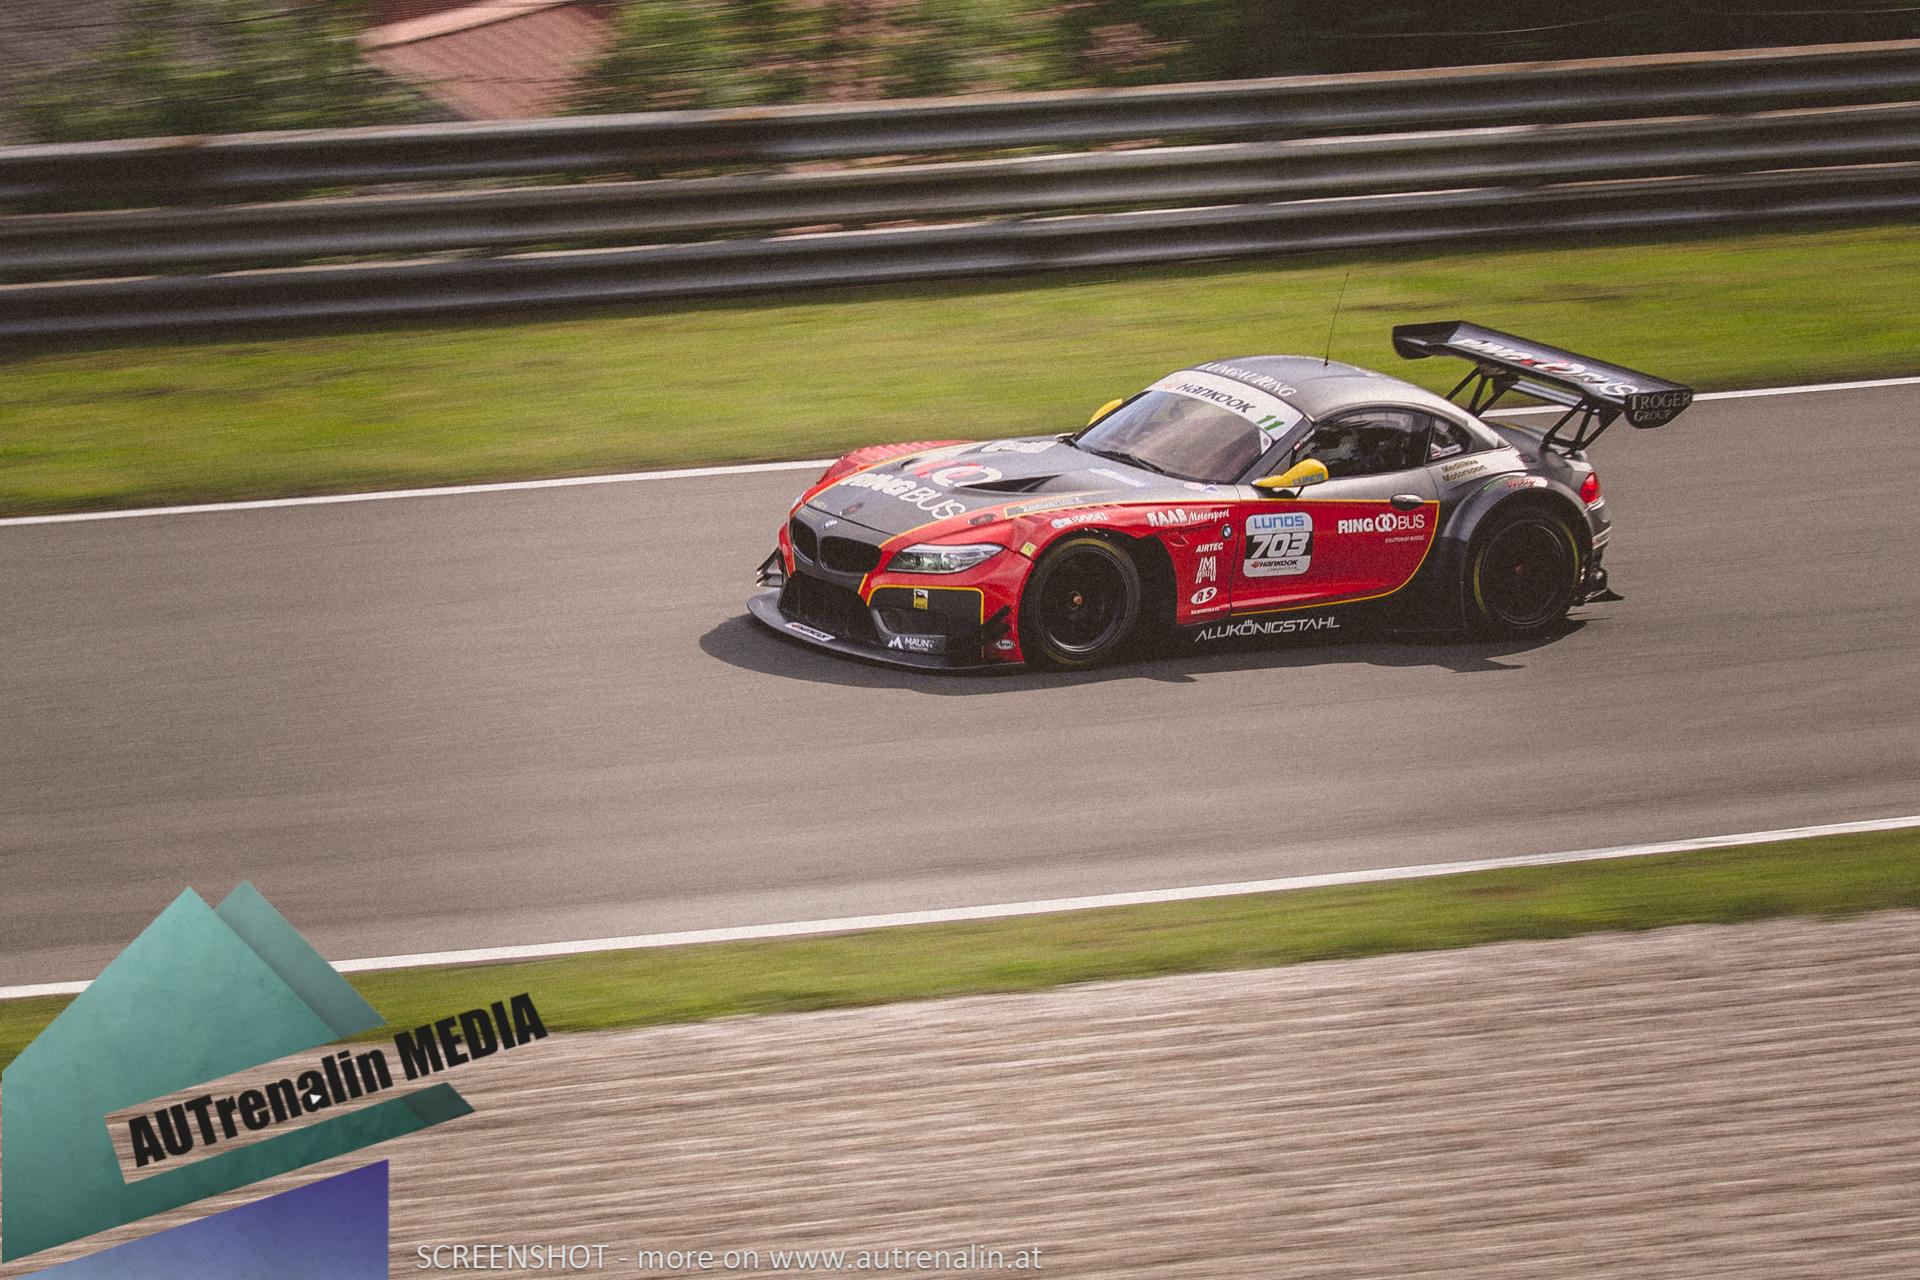 SportwagenCup_Salzburgring-Mai-2018_AUTrenalinMEDIA_web-6686.jpg